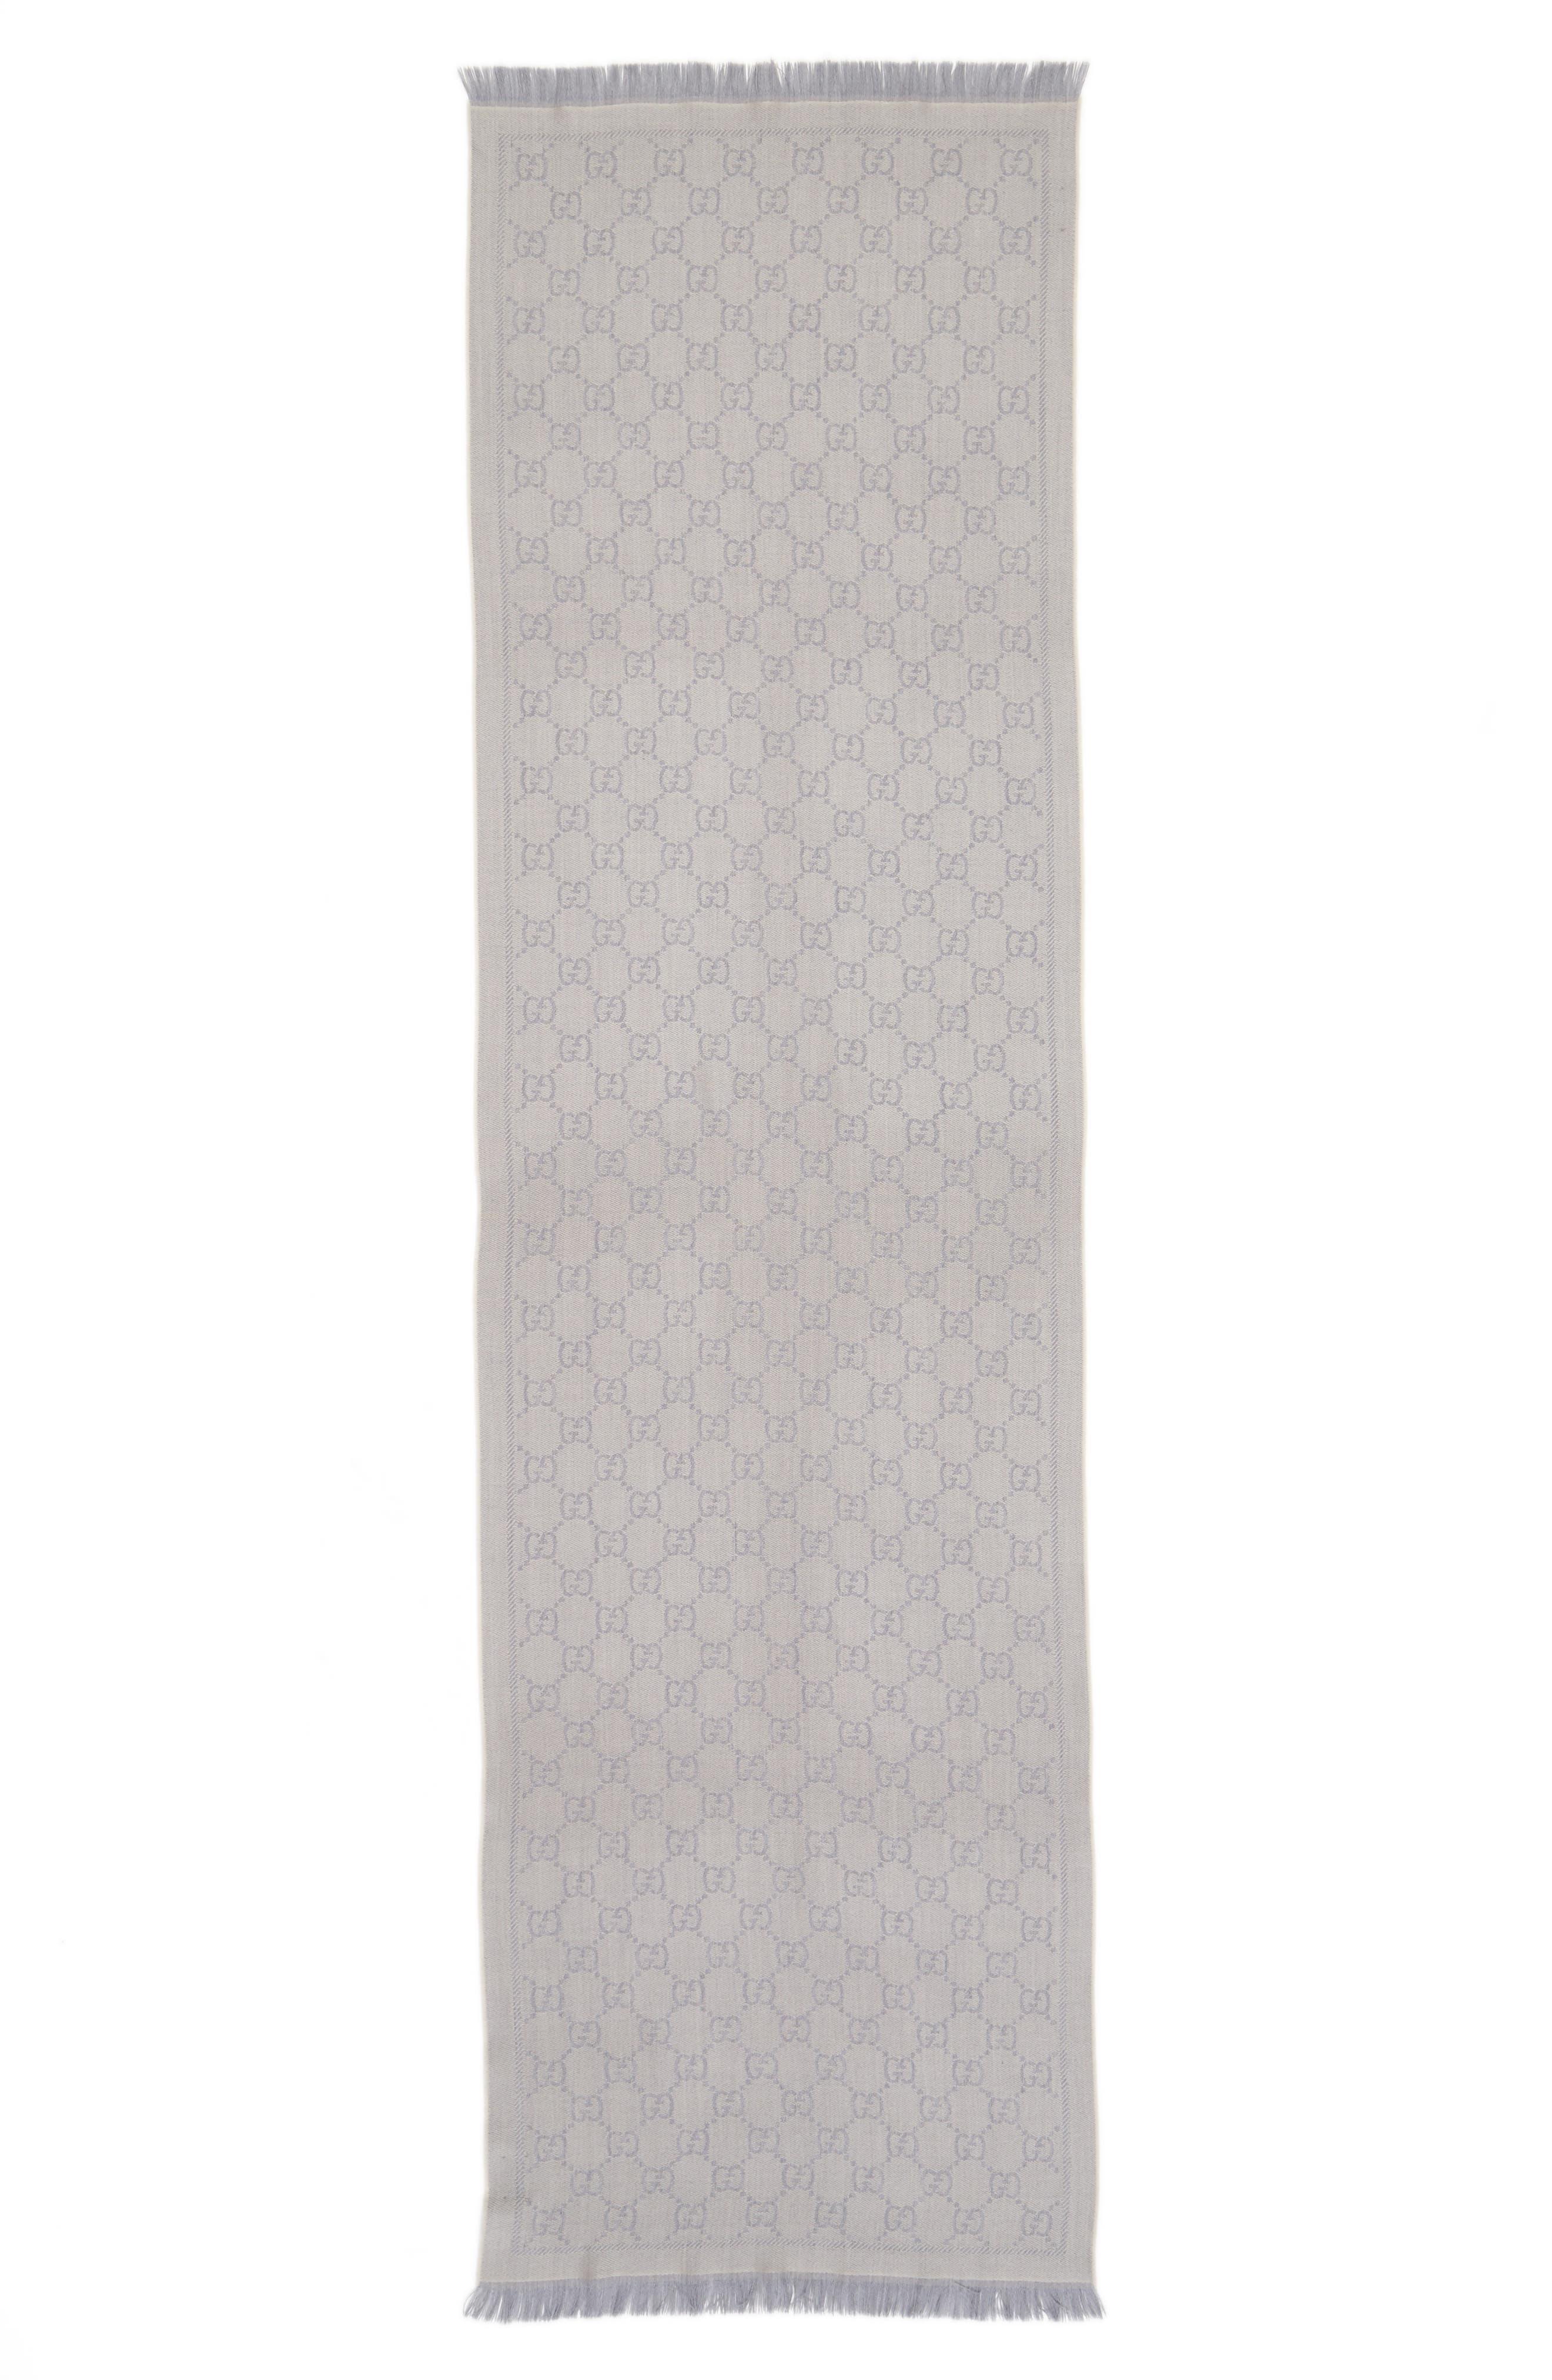 GG Jacquard Wool Scarf,                             Alternate thumbnail 2, color,                             1763 Zinc/Ight Grey